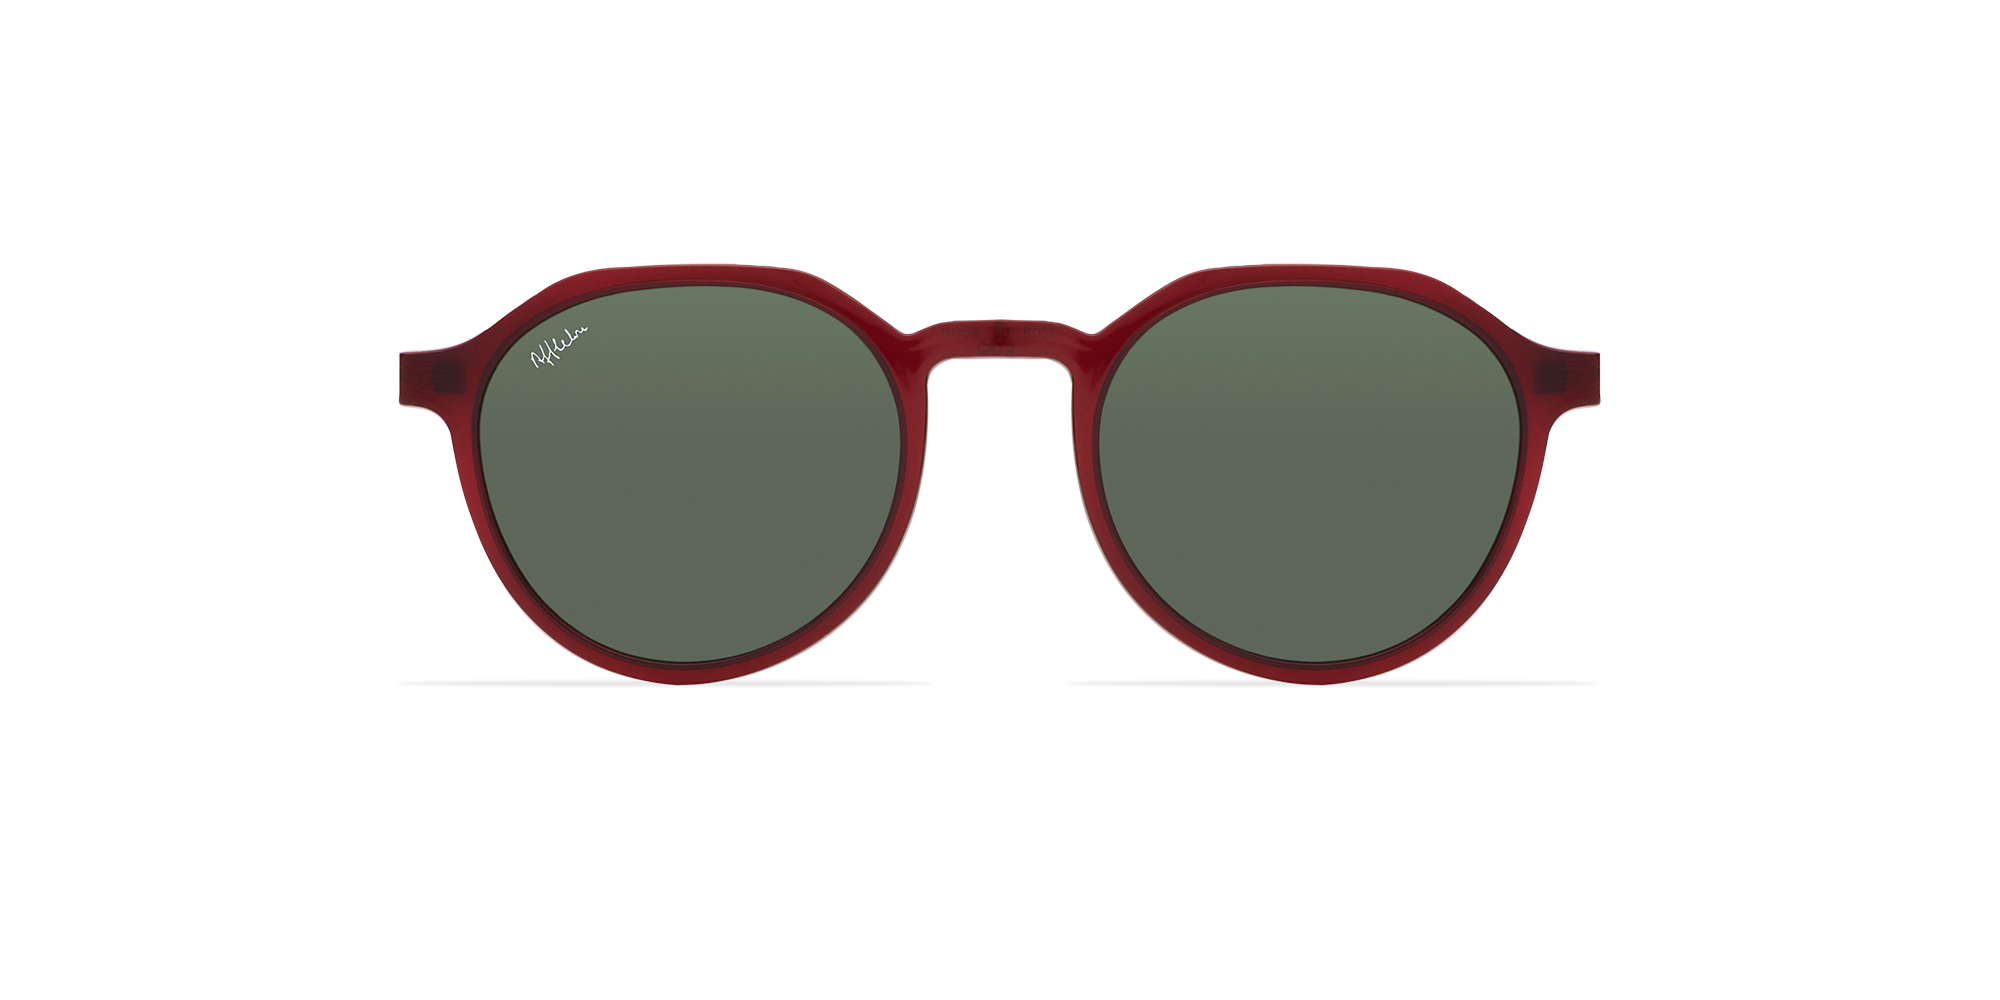 afflelou/france/products/smart_clip/clips_glasses/07630036428924_face.png